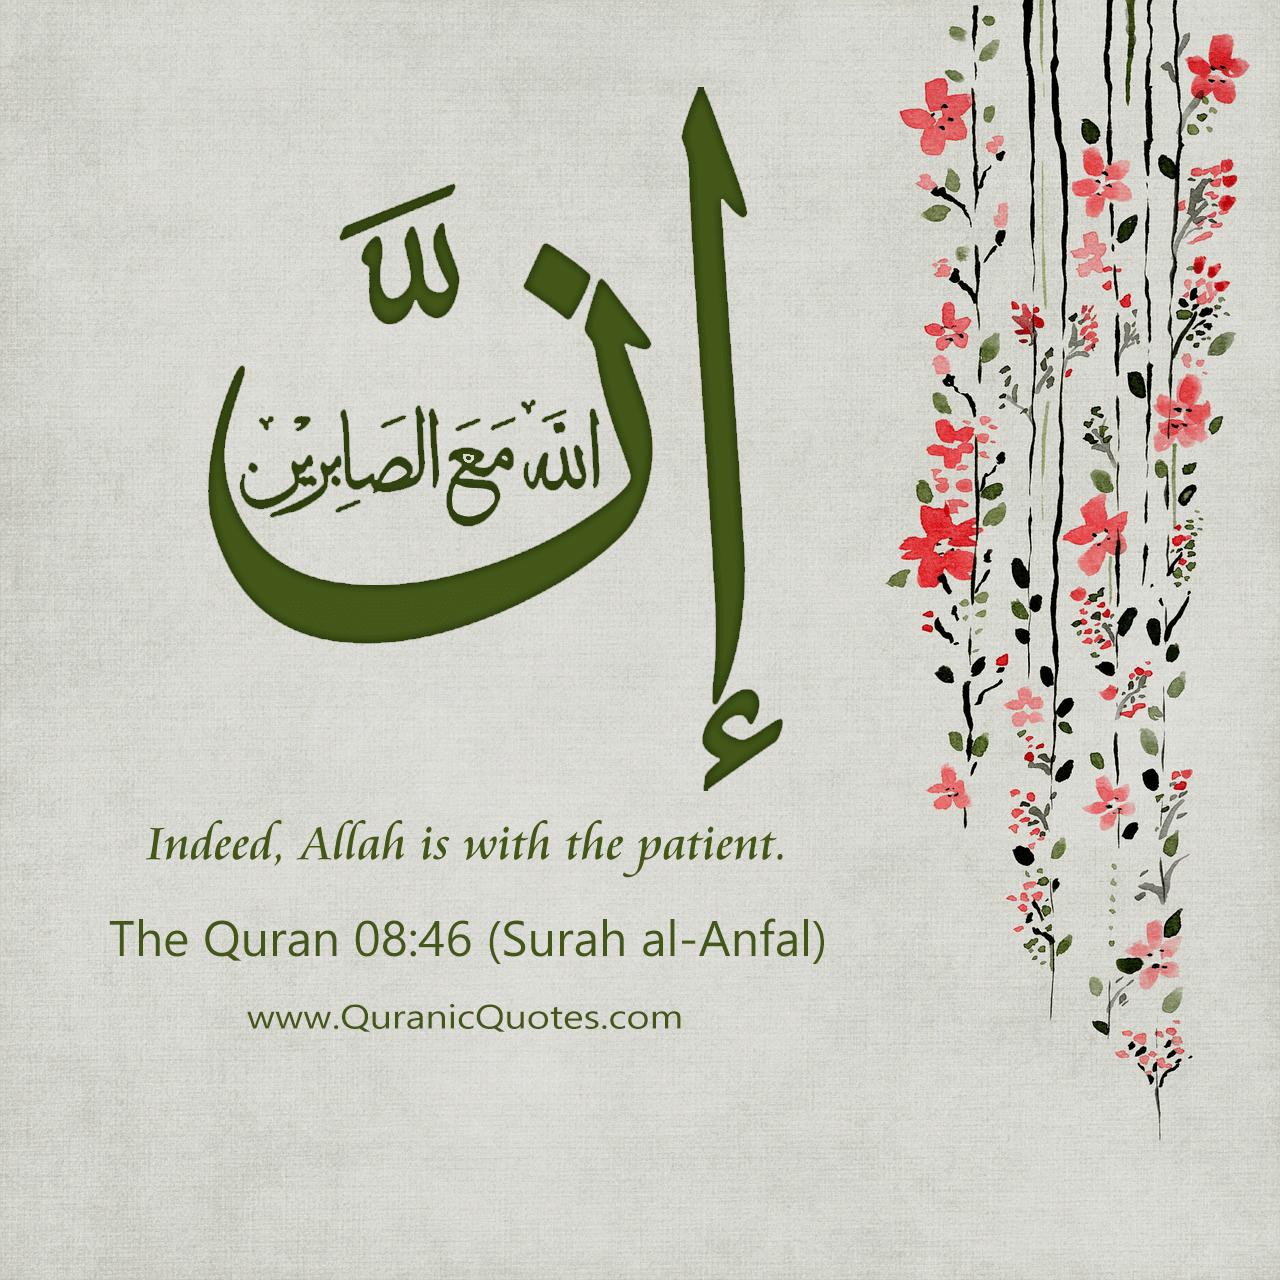 Islamic Quotes In Arabic